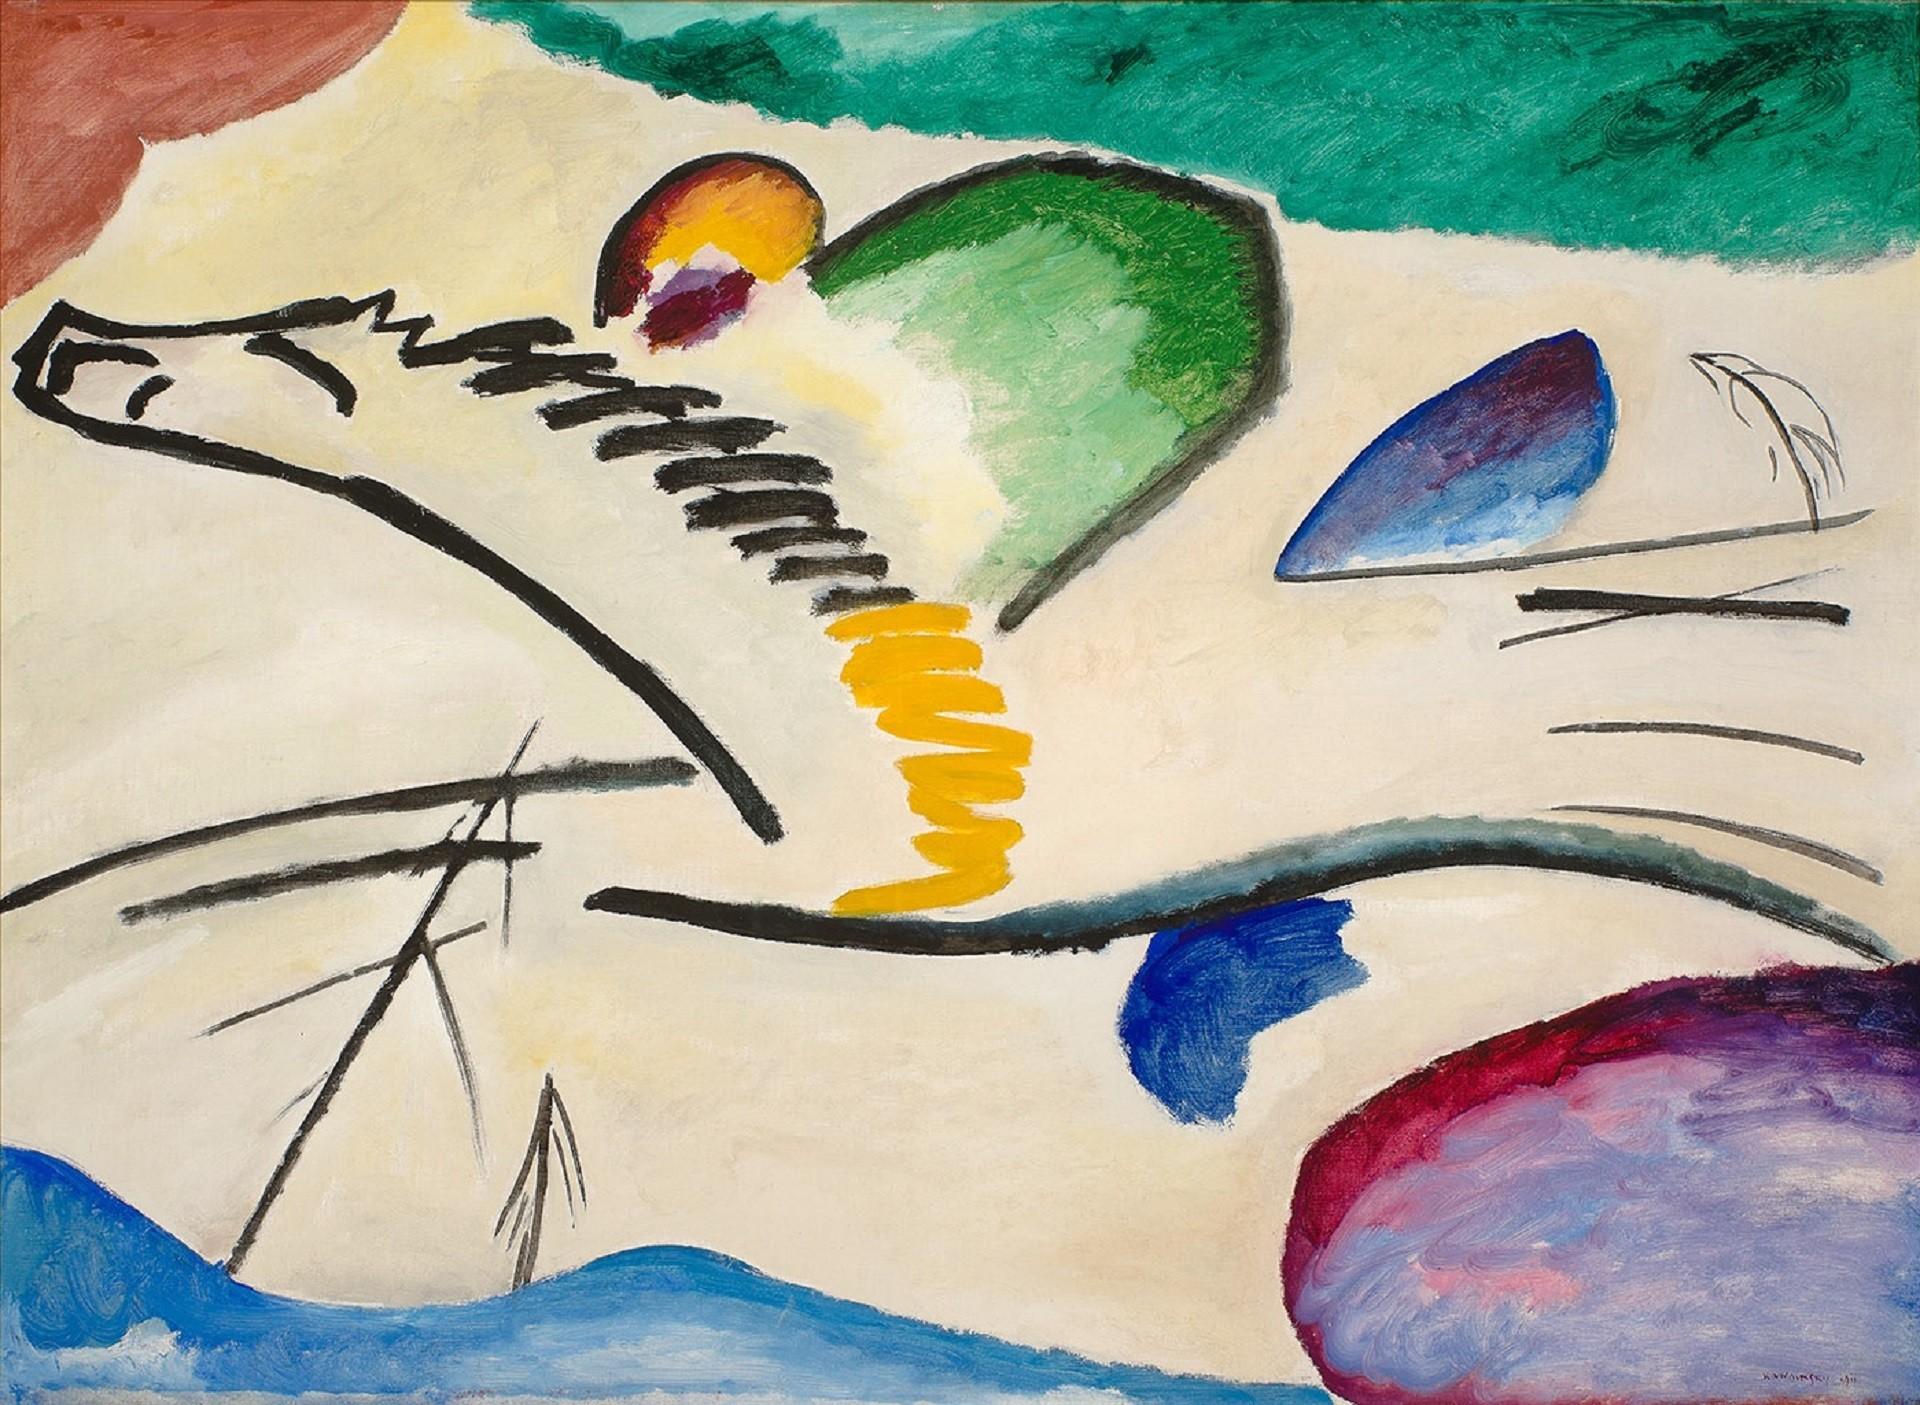 10 Artworks By Kandinsky You Should Know